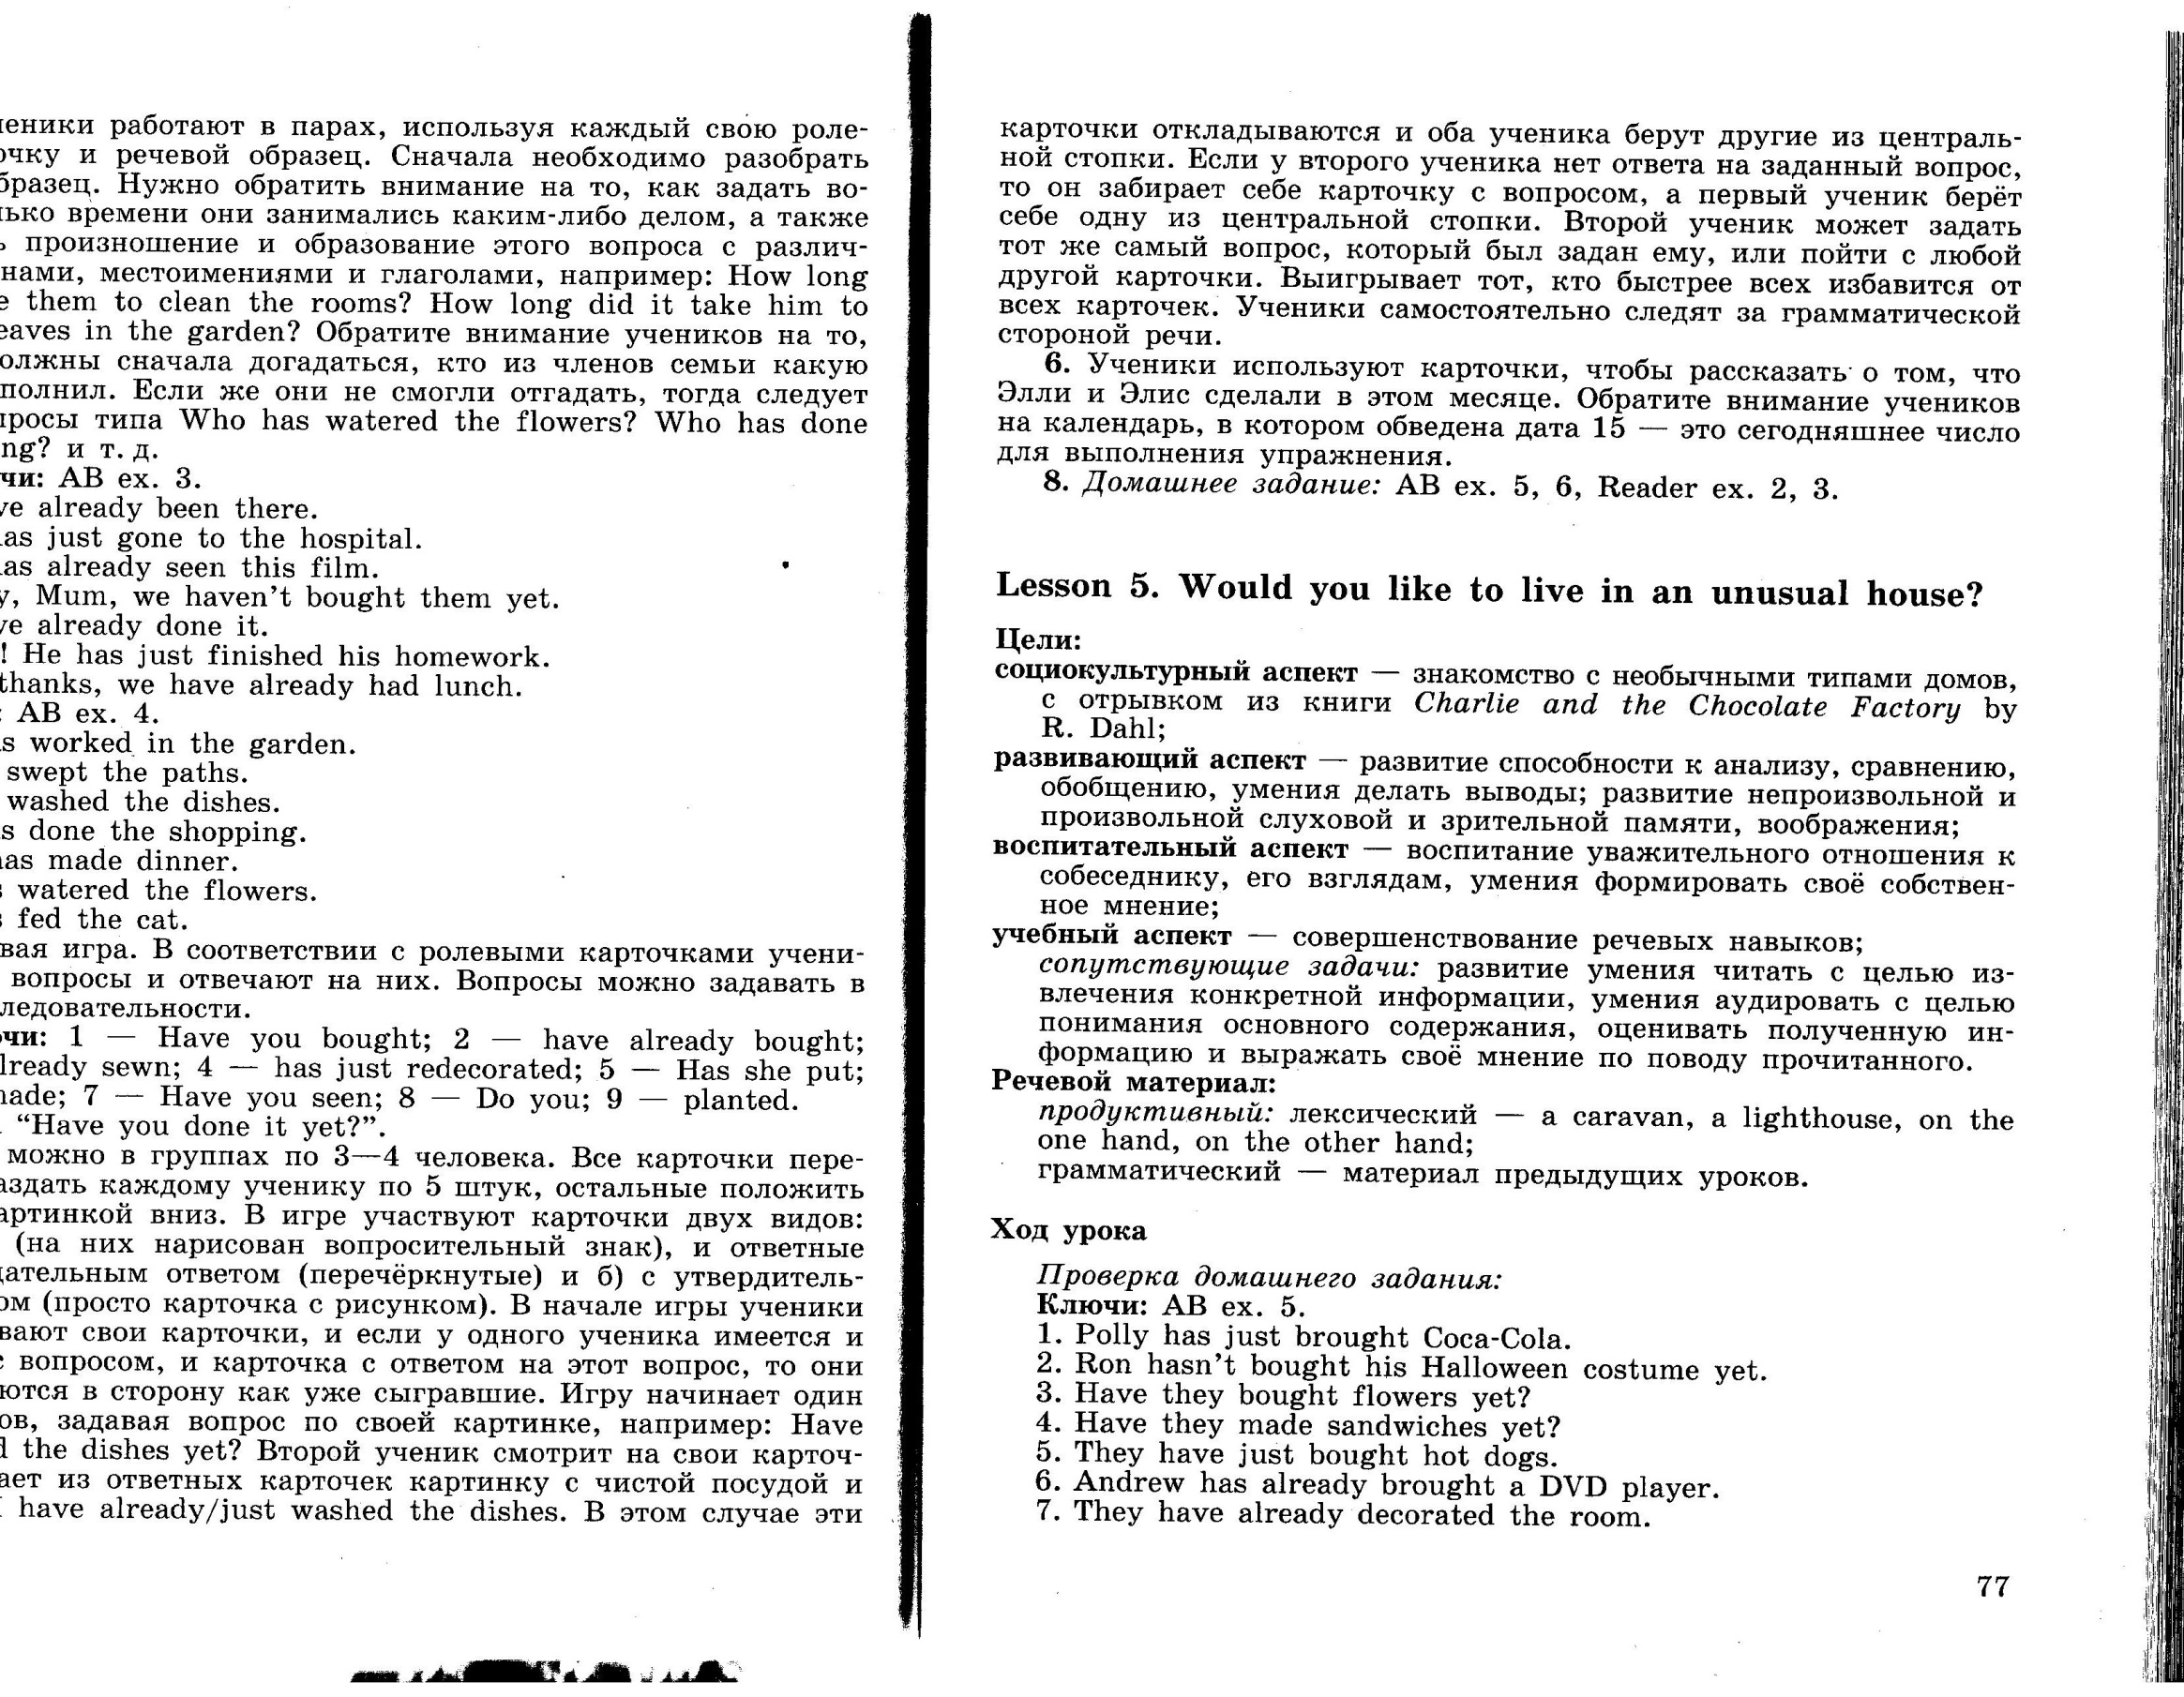 C:\Users\Грузиновская СОШ\Documents\Scanned Documents\Рисунок (1964).jpg